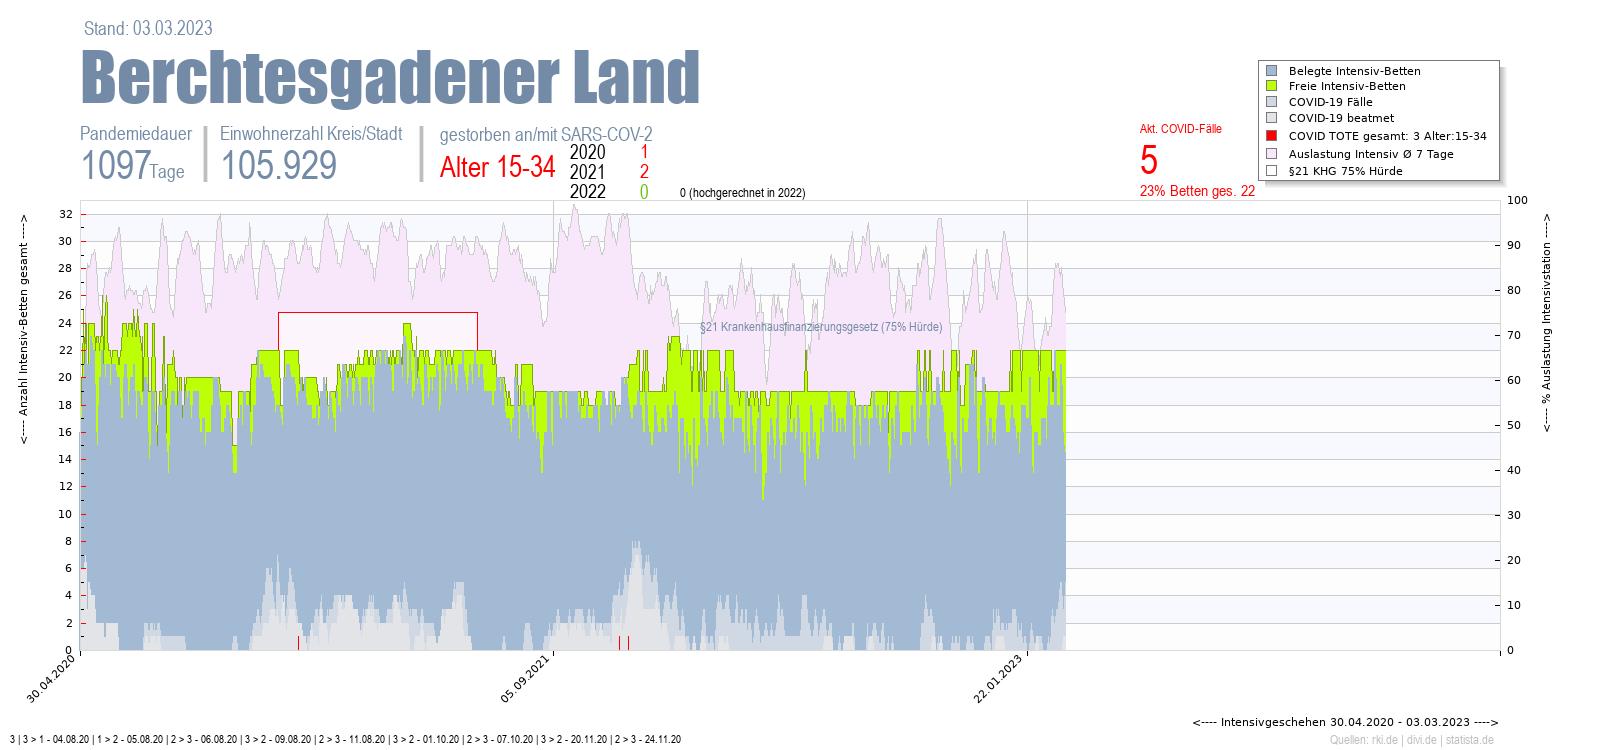 Intensivstation Auslastung Berchtesgadener Land Alter 0-4